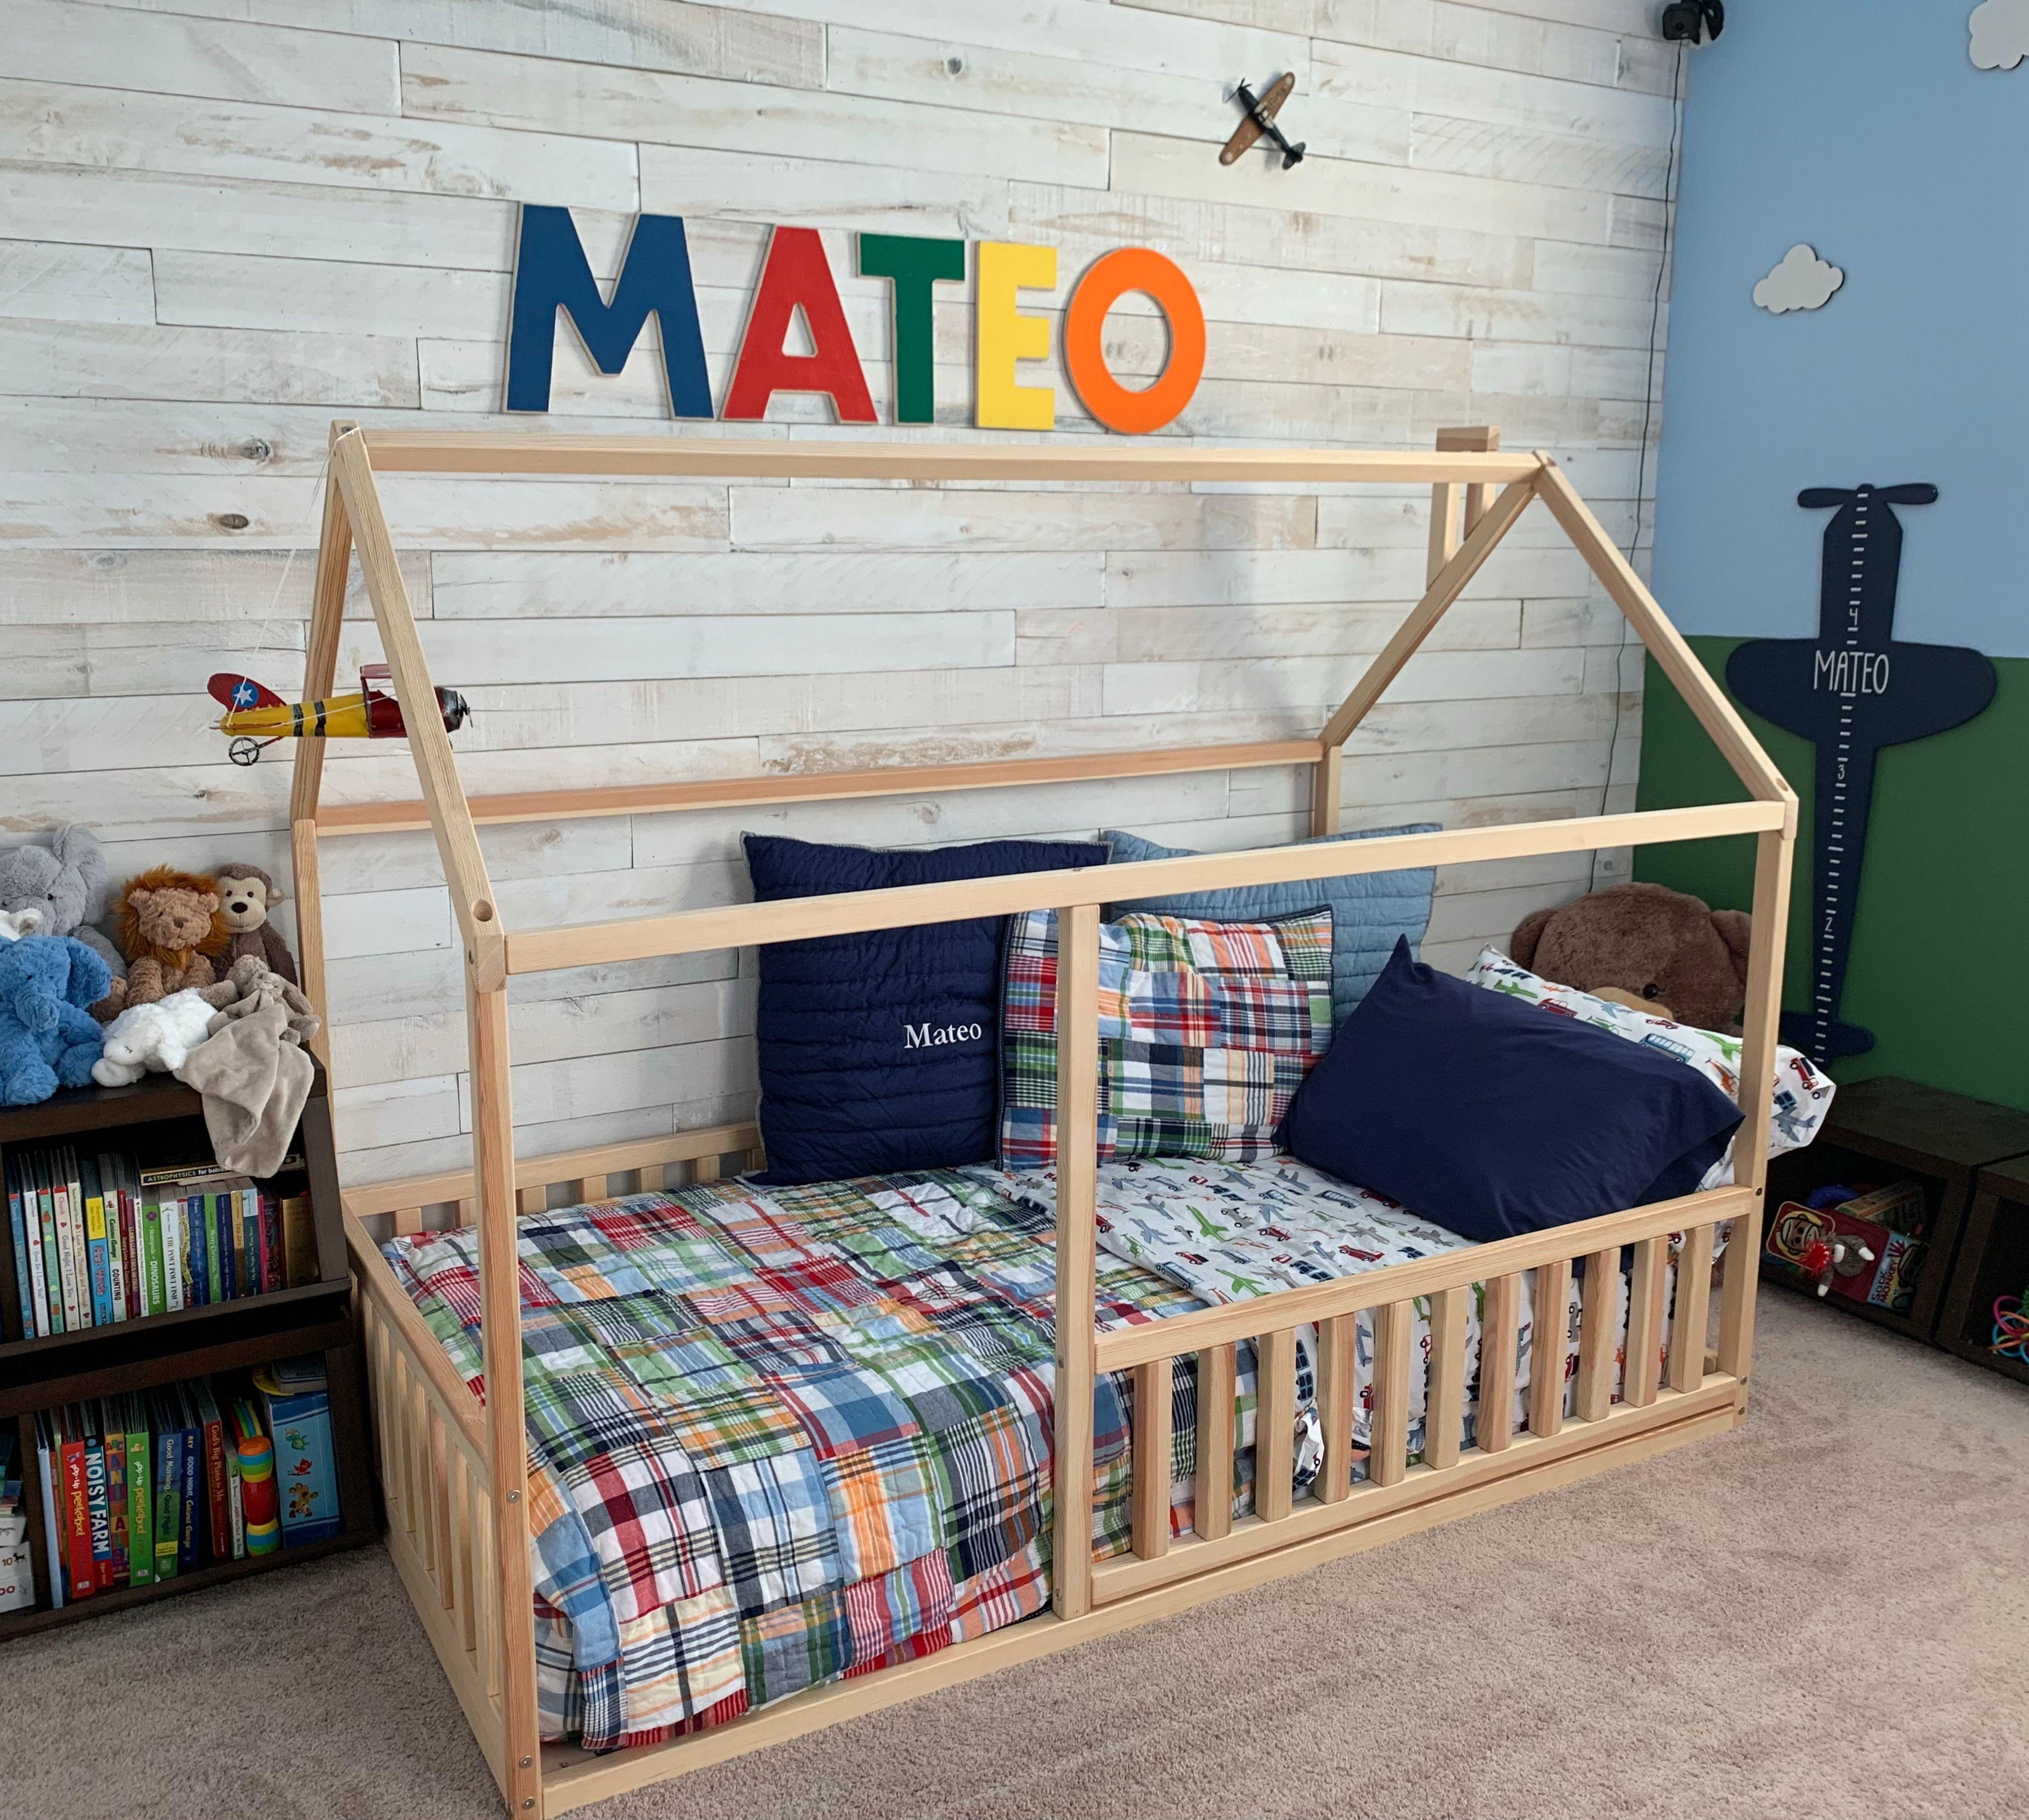 Toddler Bed Children Bed Montessori House Bed Montessori Bed Floor